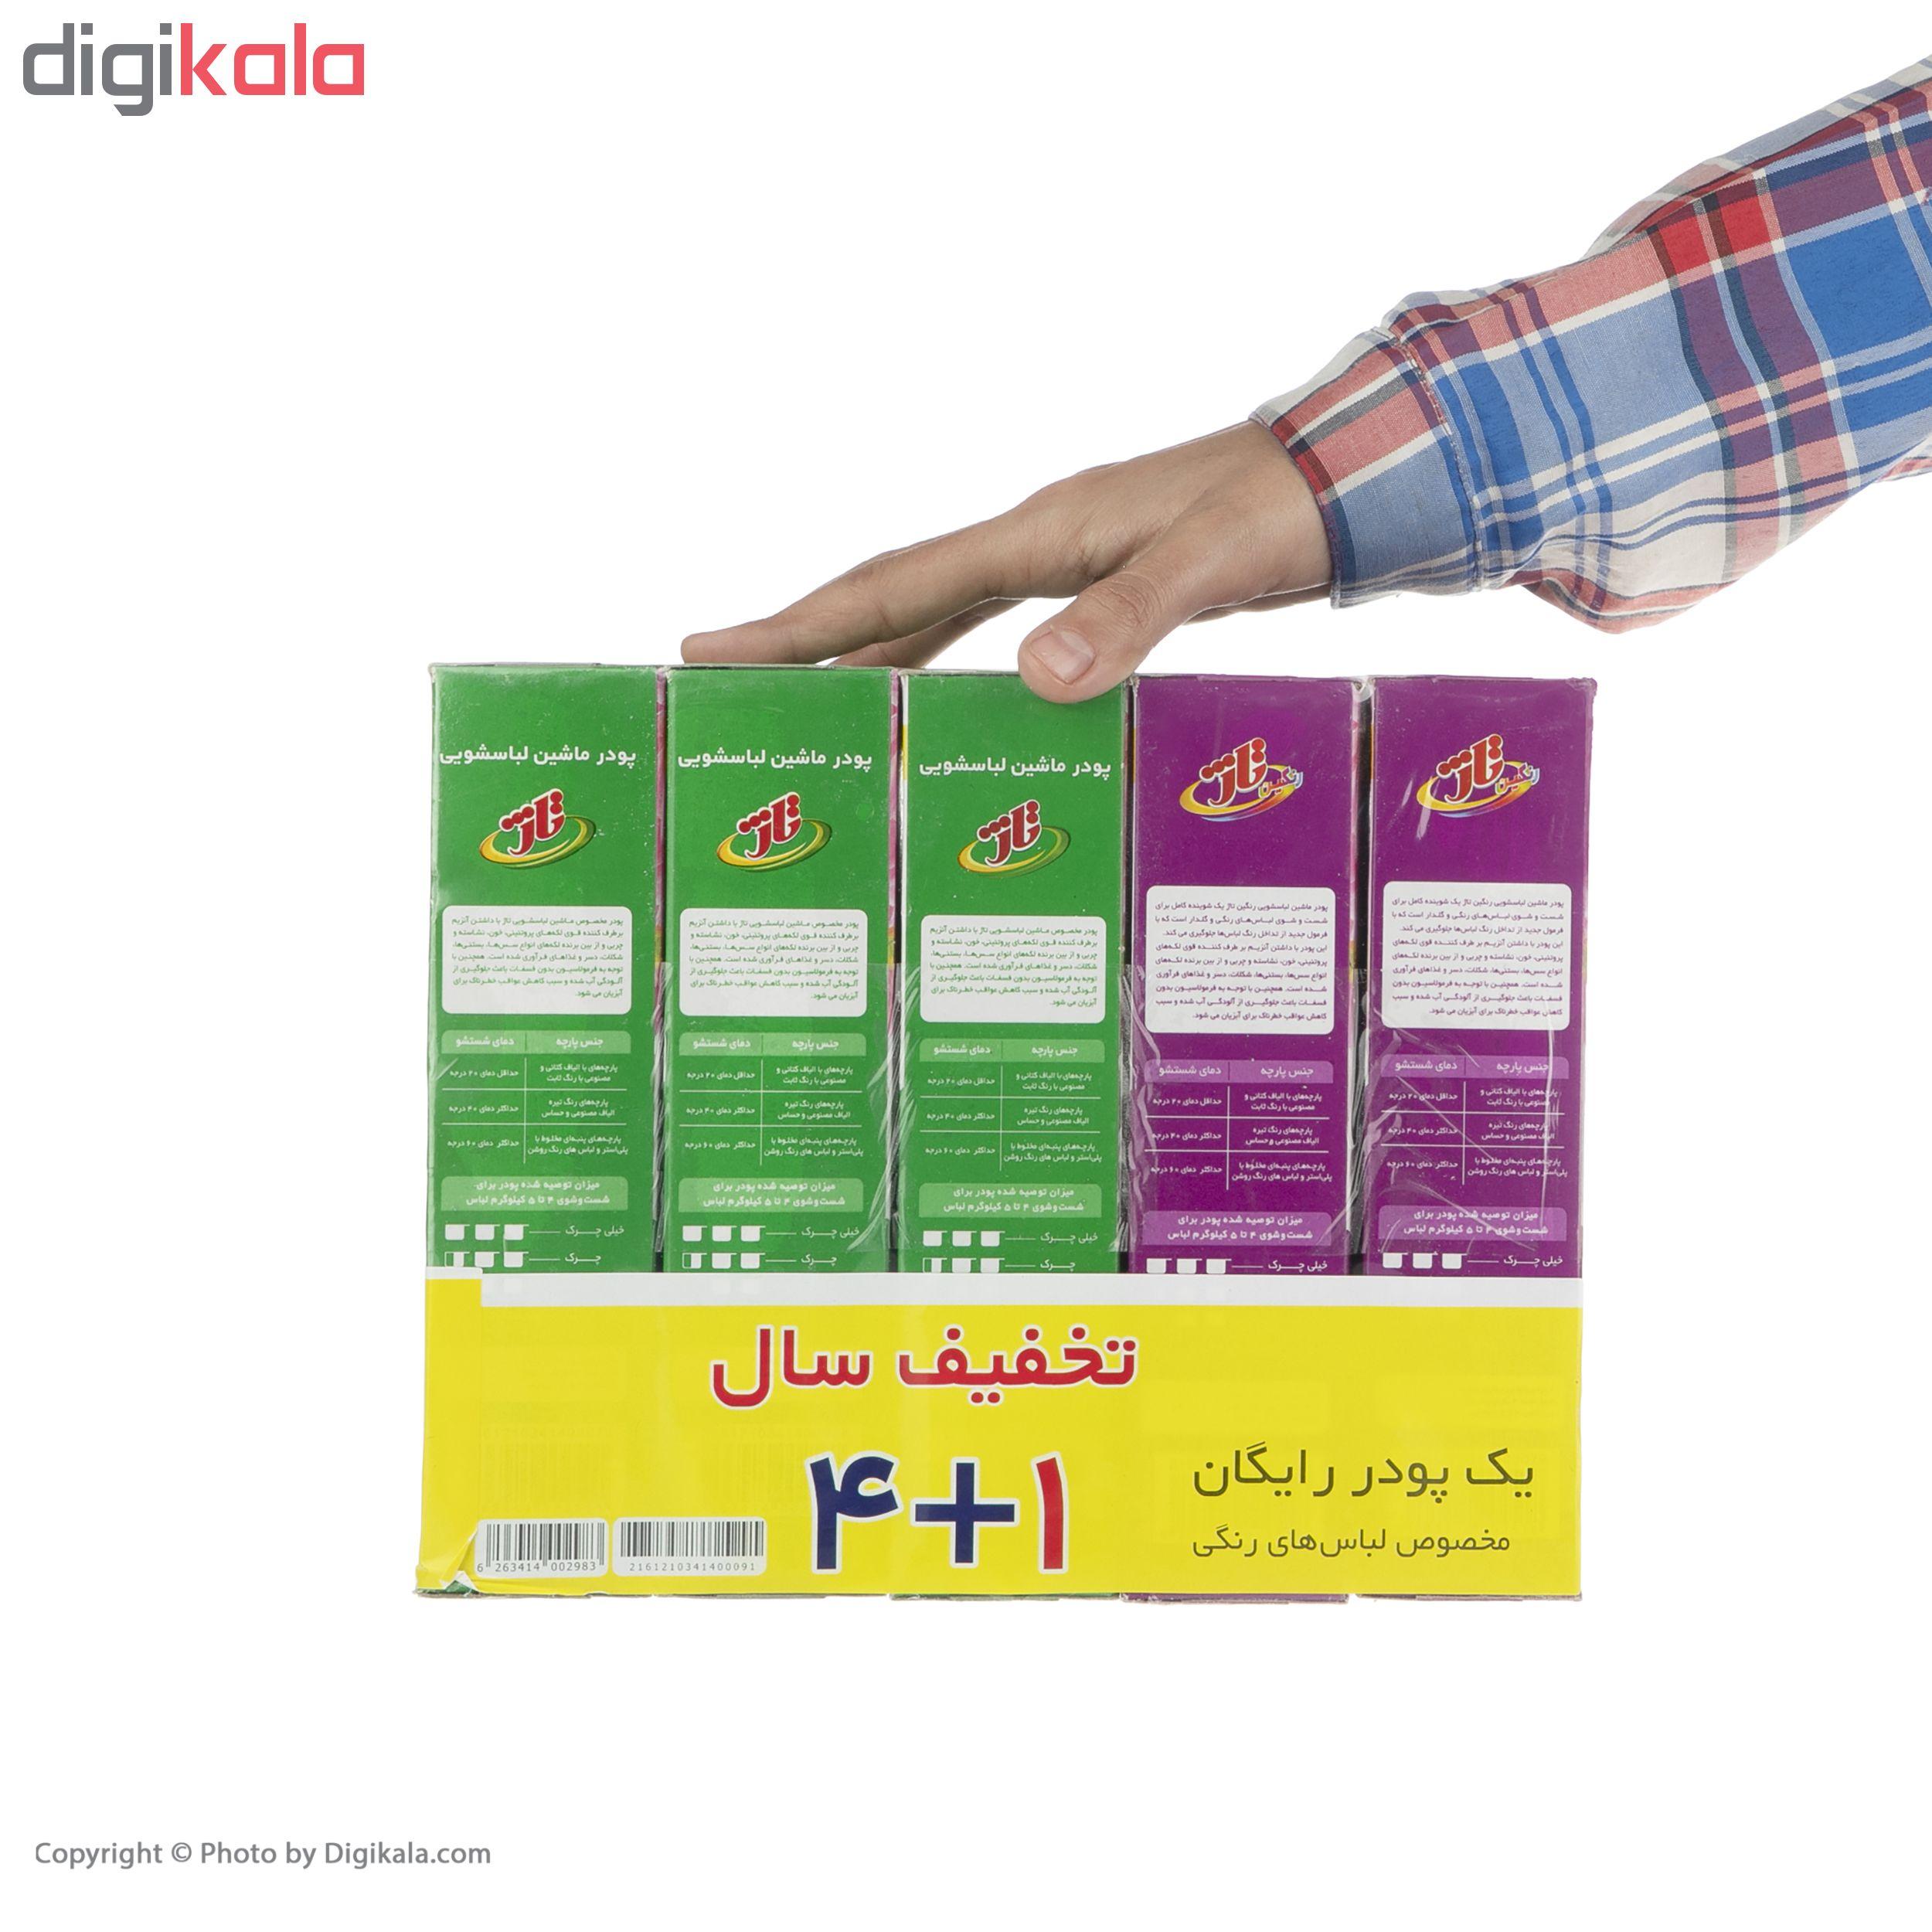 پودر ماشین لباسشویی رنگین شوی تاژ مدل Spring Bloom بسته 5 عددی main 1 4